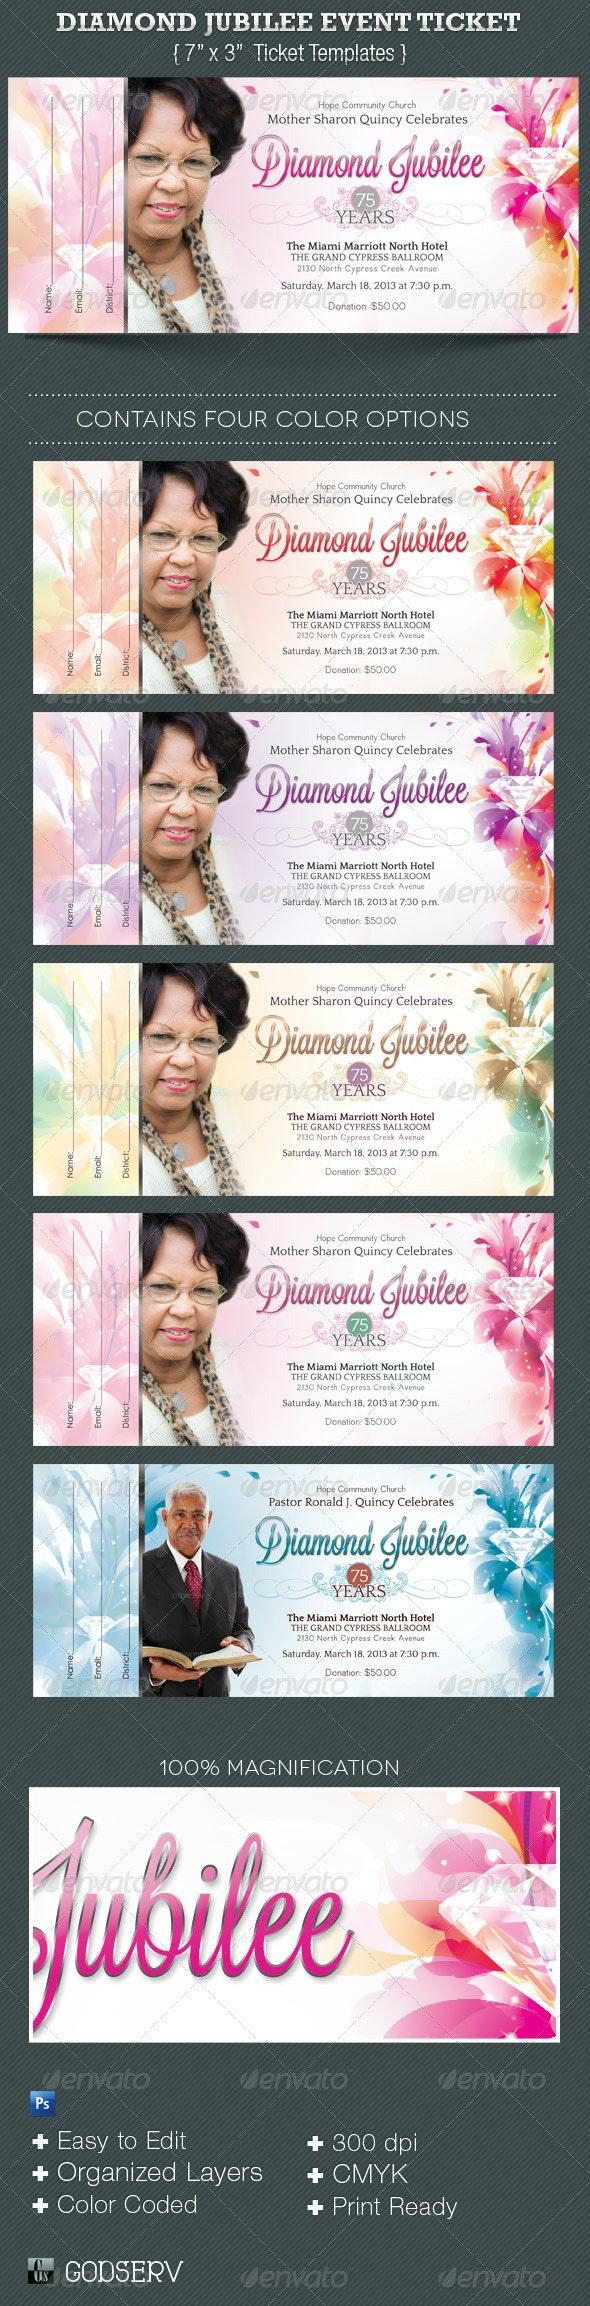 Diamond Jubilee Event Ticket Template - Miscellaneous Print Templates